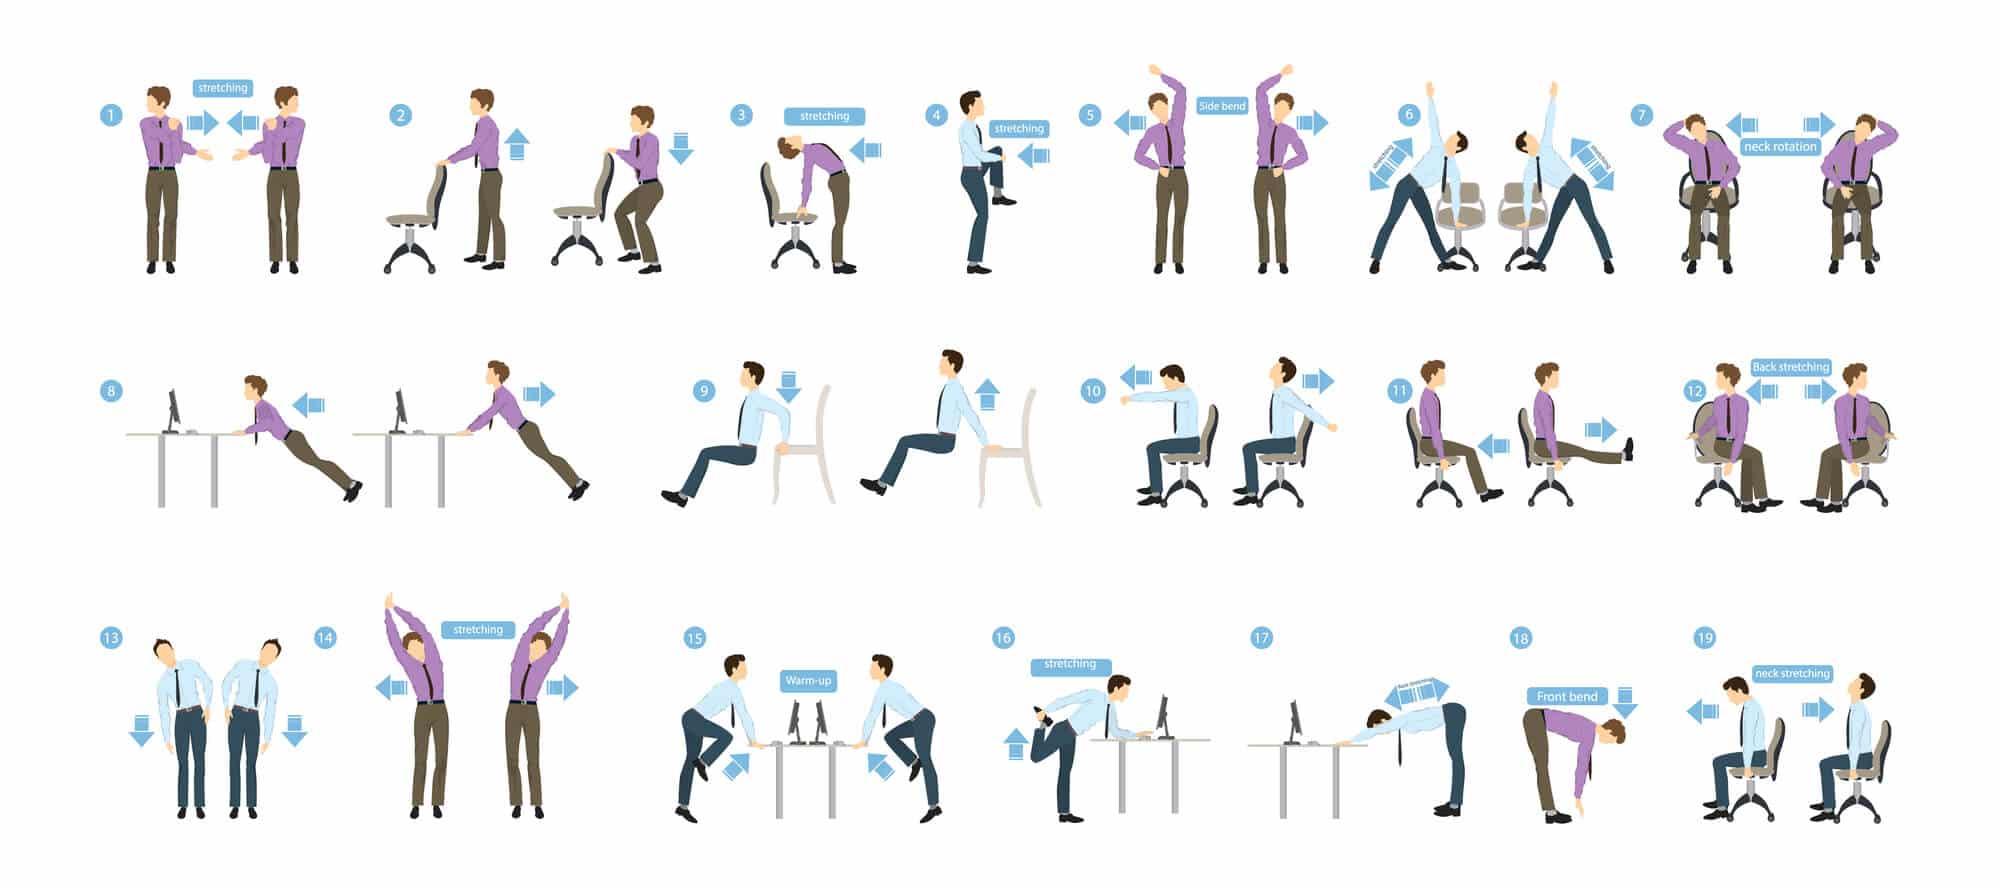 fat burning exercises while sitting - Fitness Expo